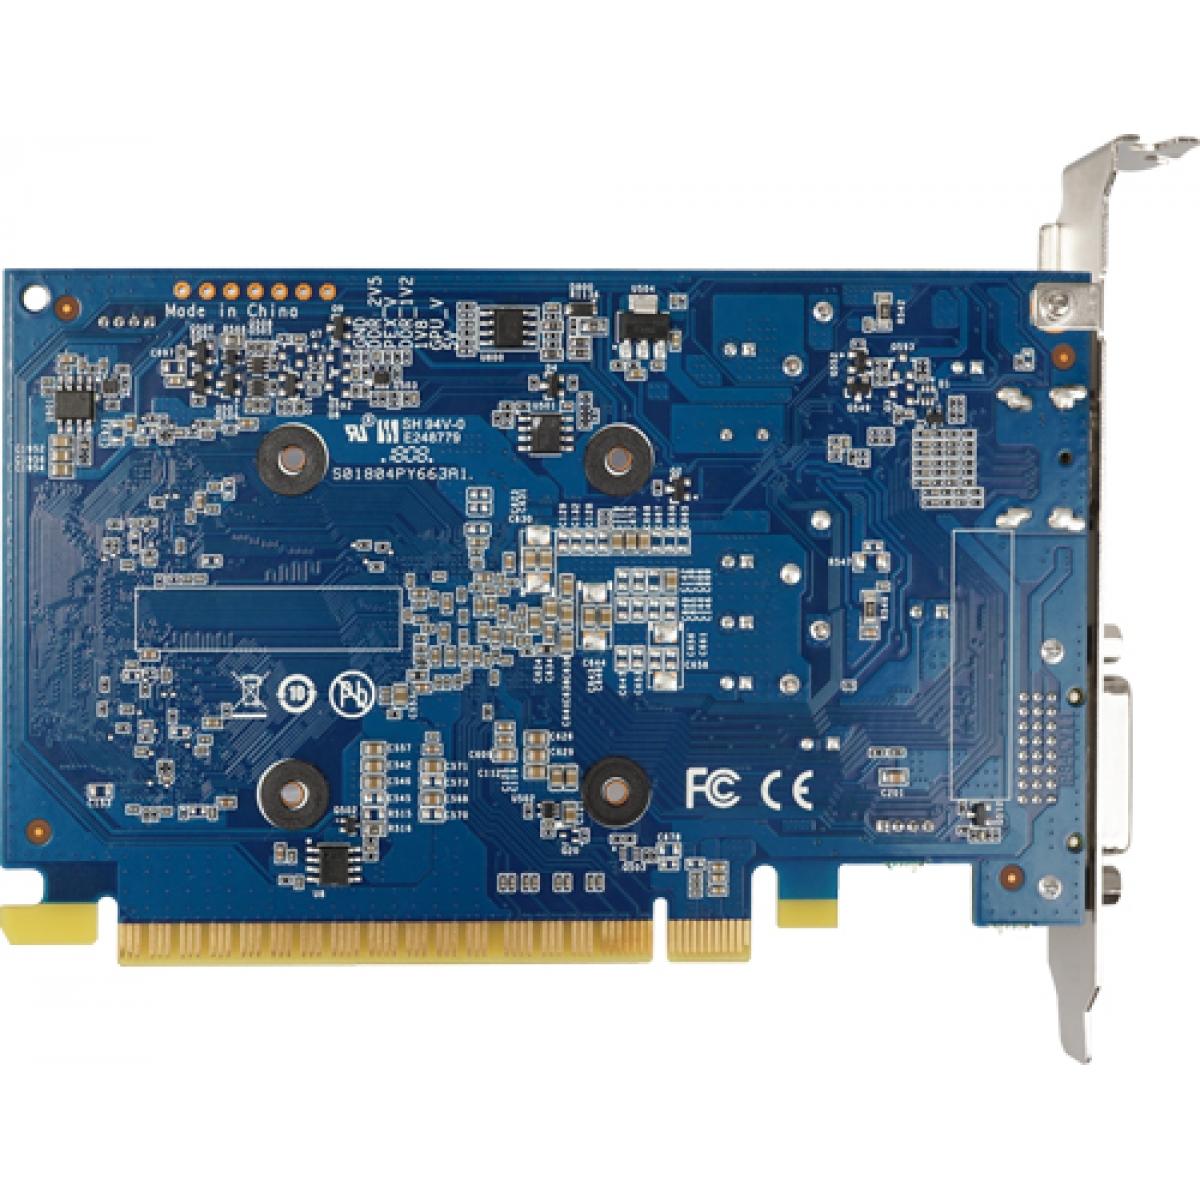 Placa de Vídeo Galax GeForce GT 1030 2GB 30NPK4HVQ4BG DDR4 PCI-EXP